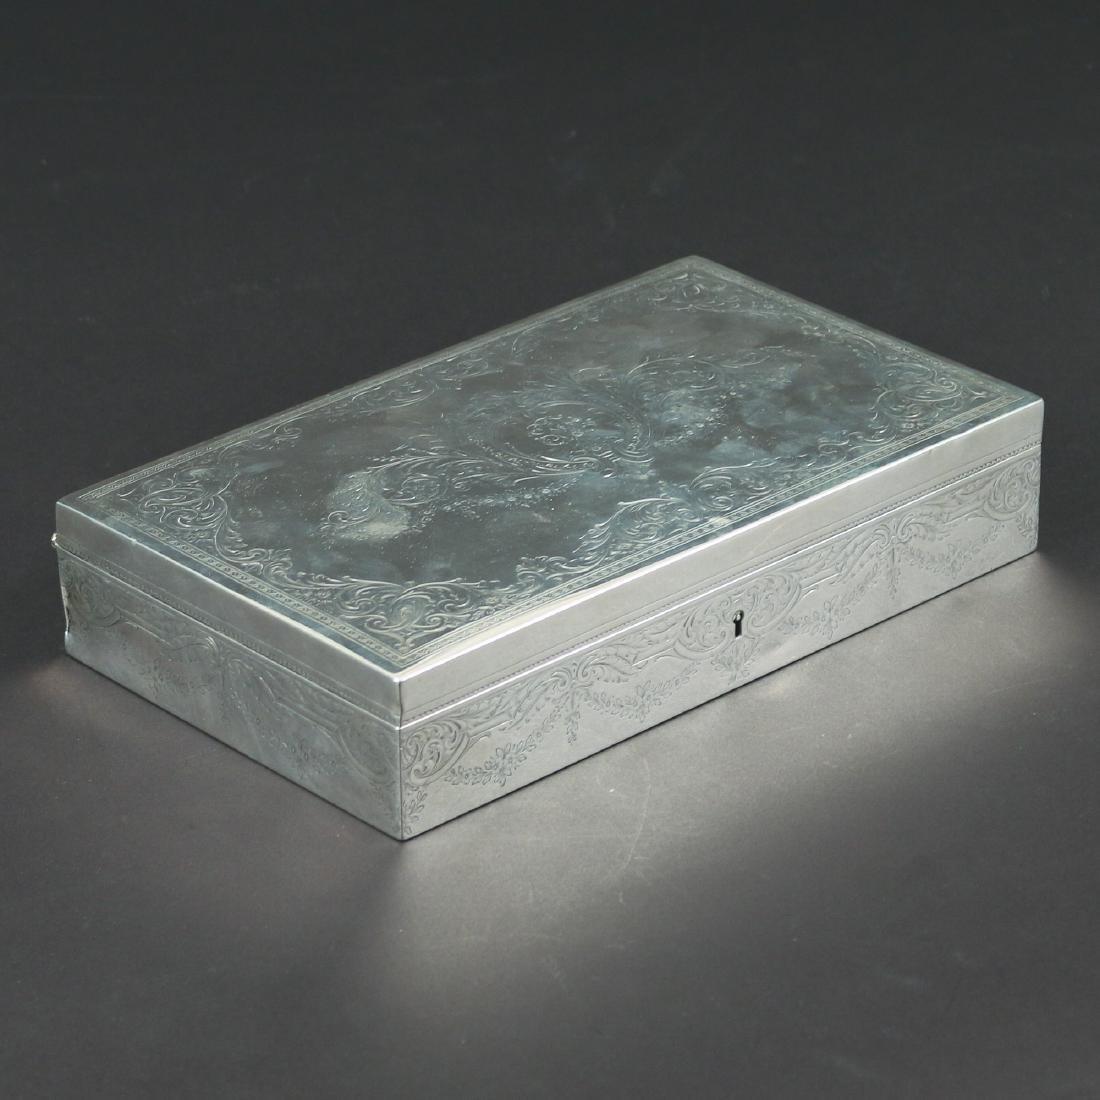 HOWARD & CO. STERLING SILVER JEWELRY BOX